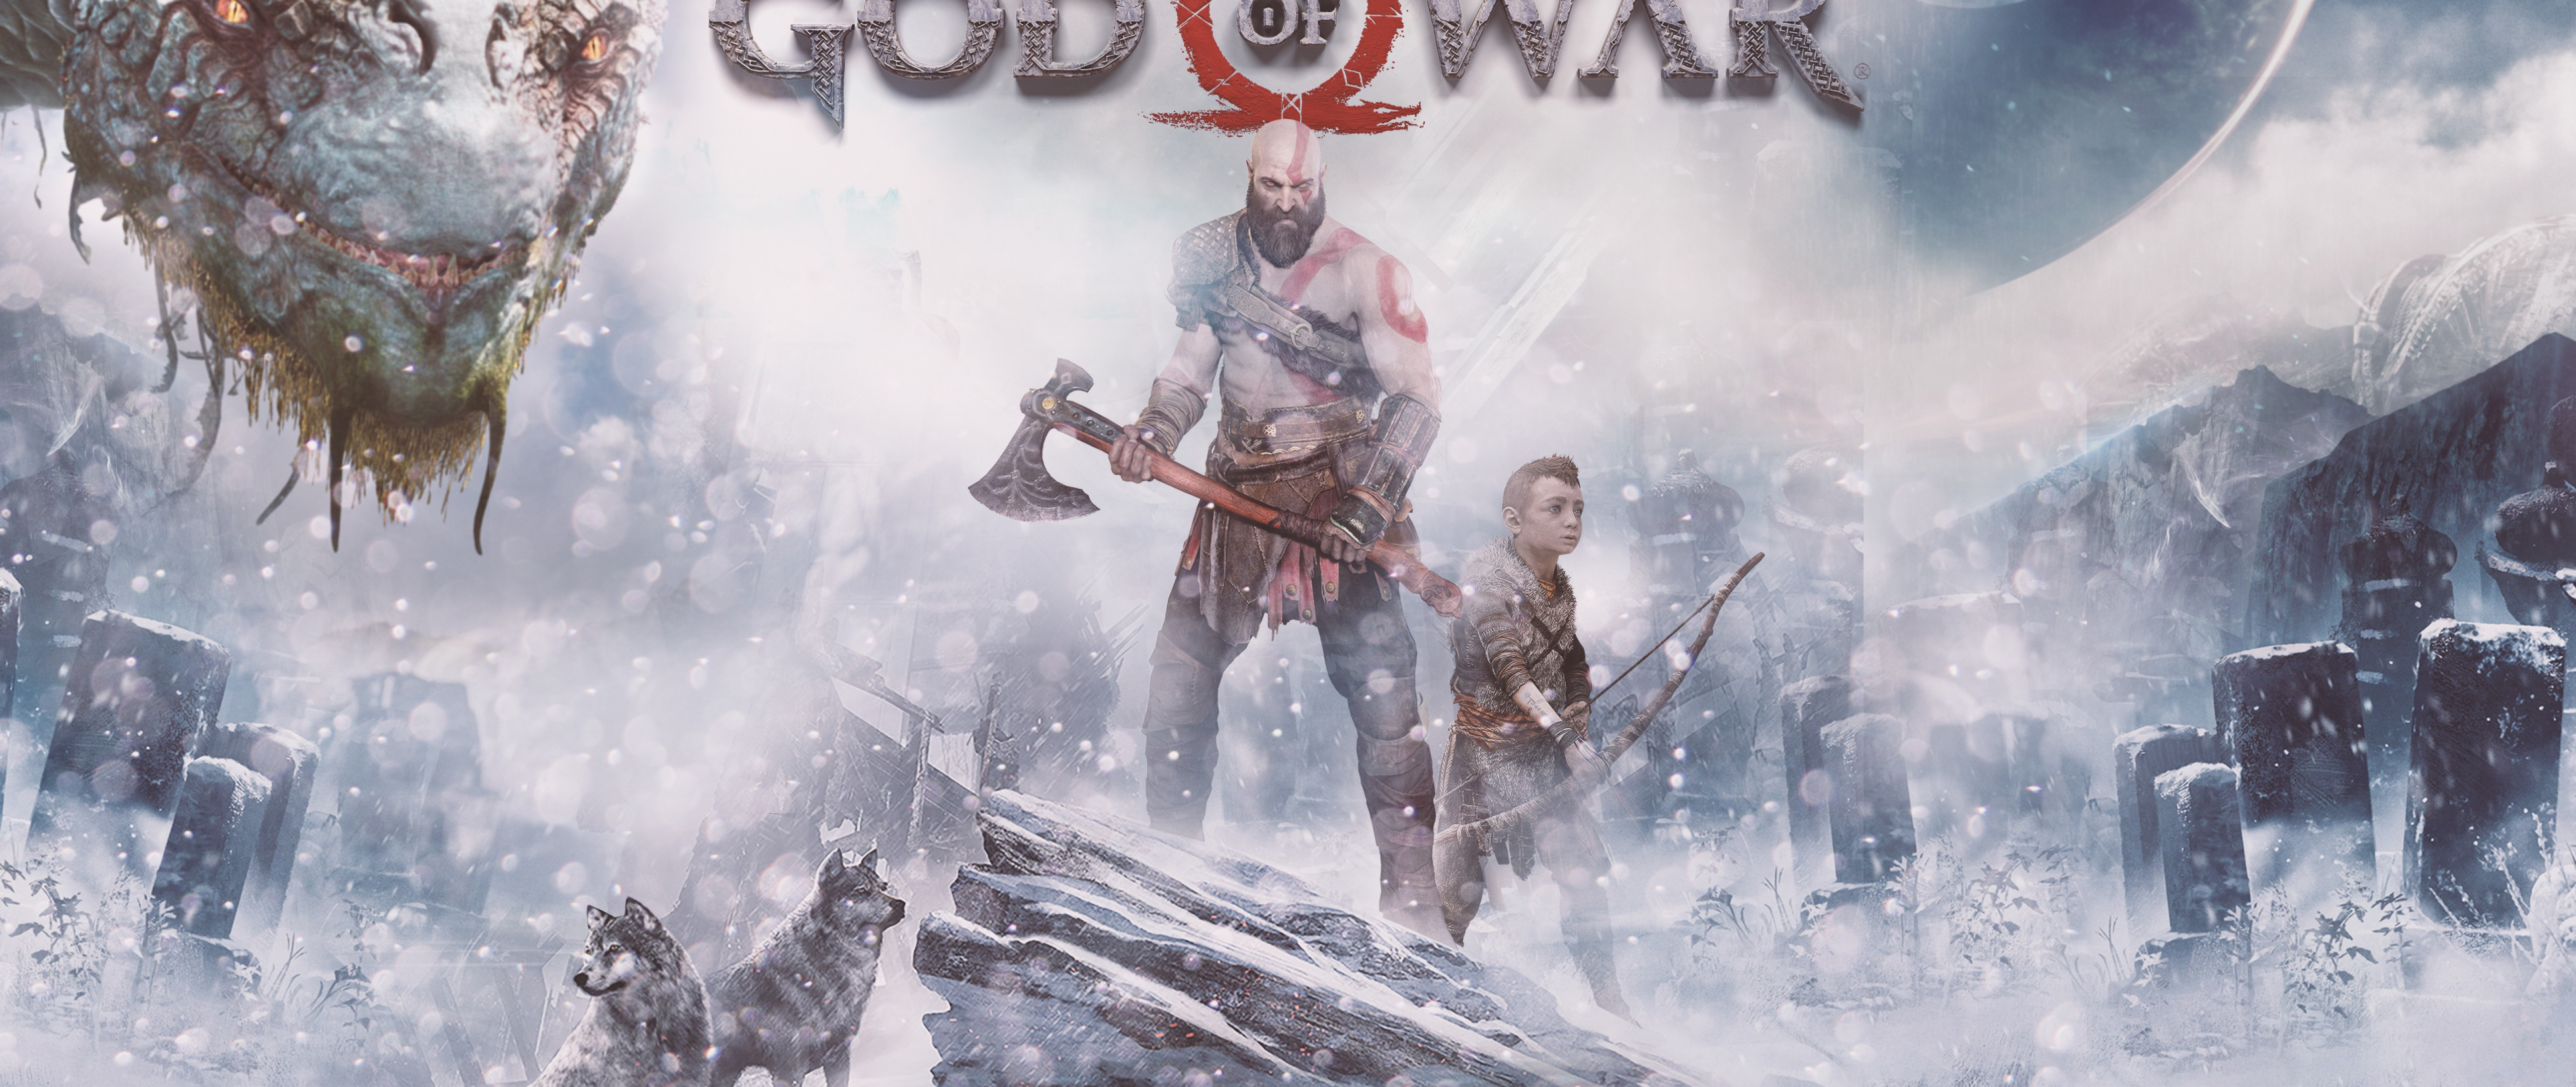 God of war ps4 4k hd wallpaper 4k ultra hd wide tv hd - God of war wallpaper for ps4 ...